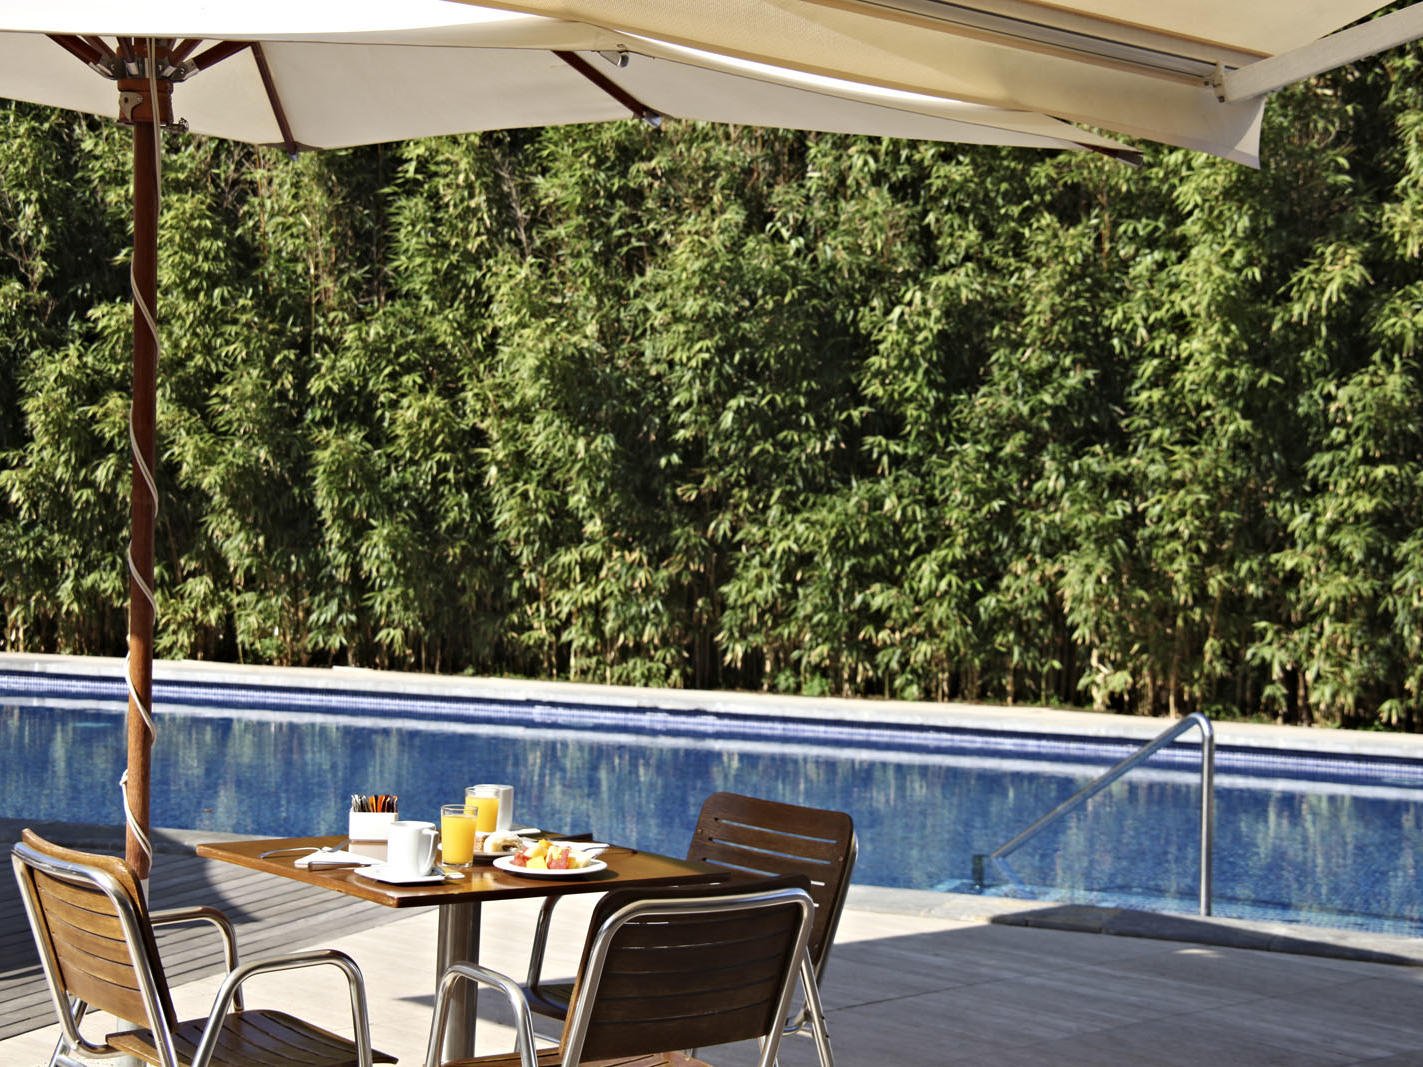 Pool at Aimia Hotel in Port de Sóller, Majorca